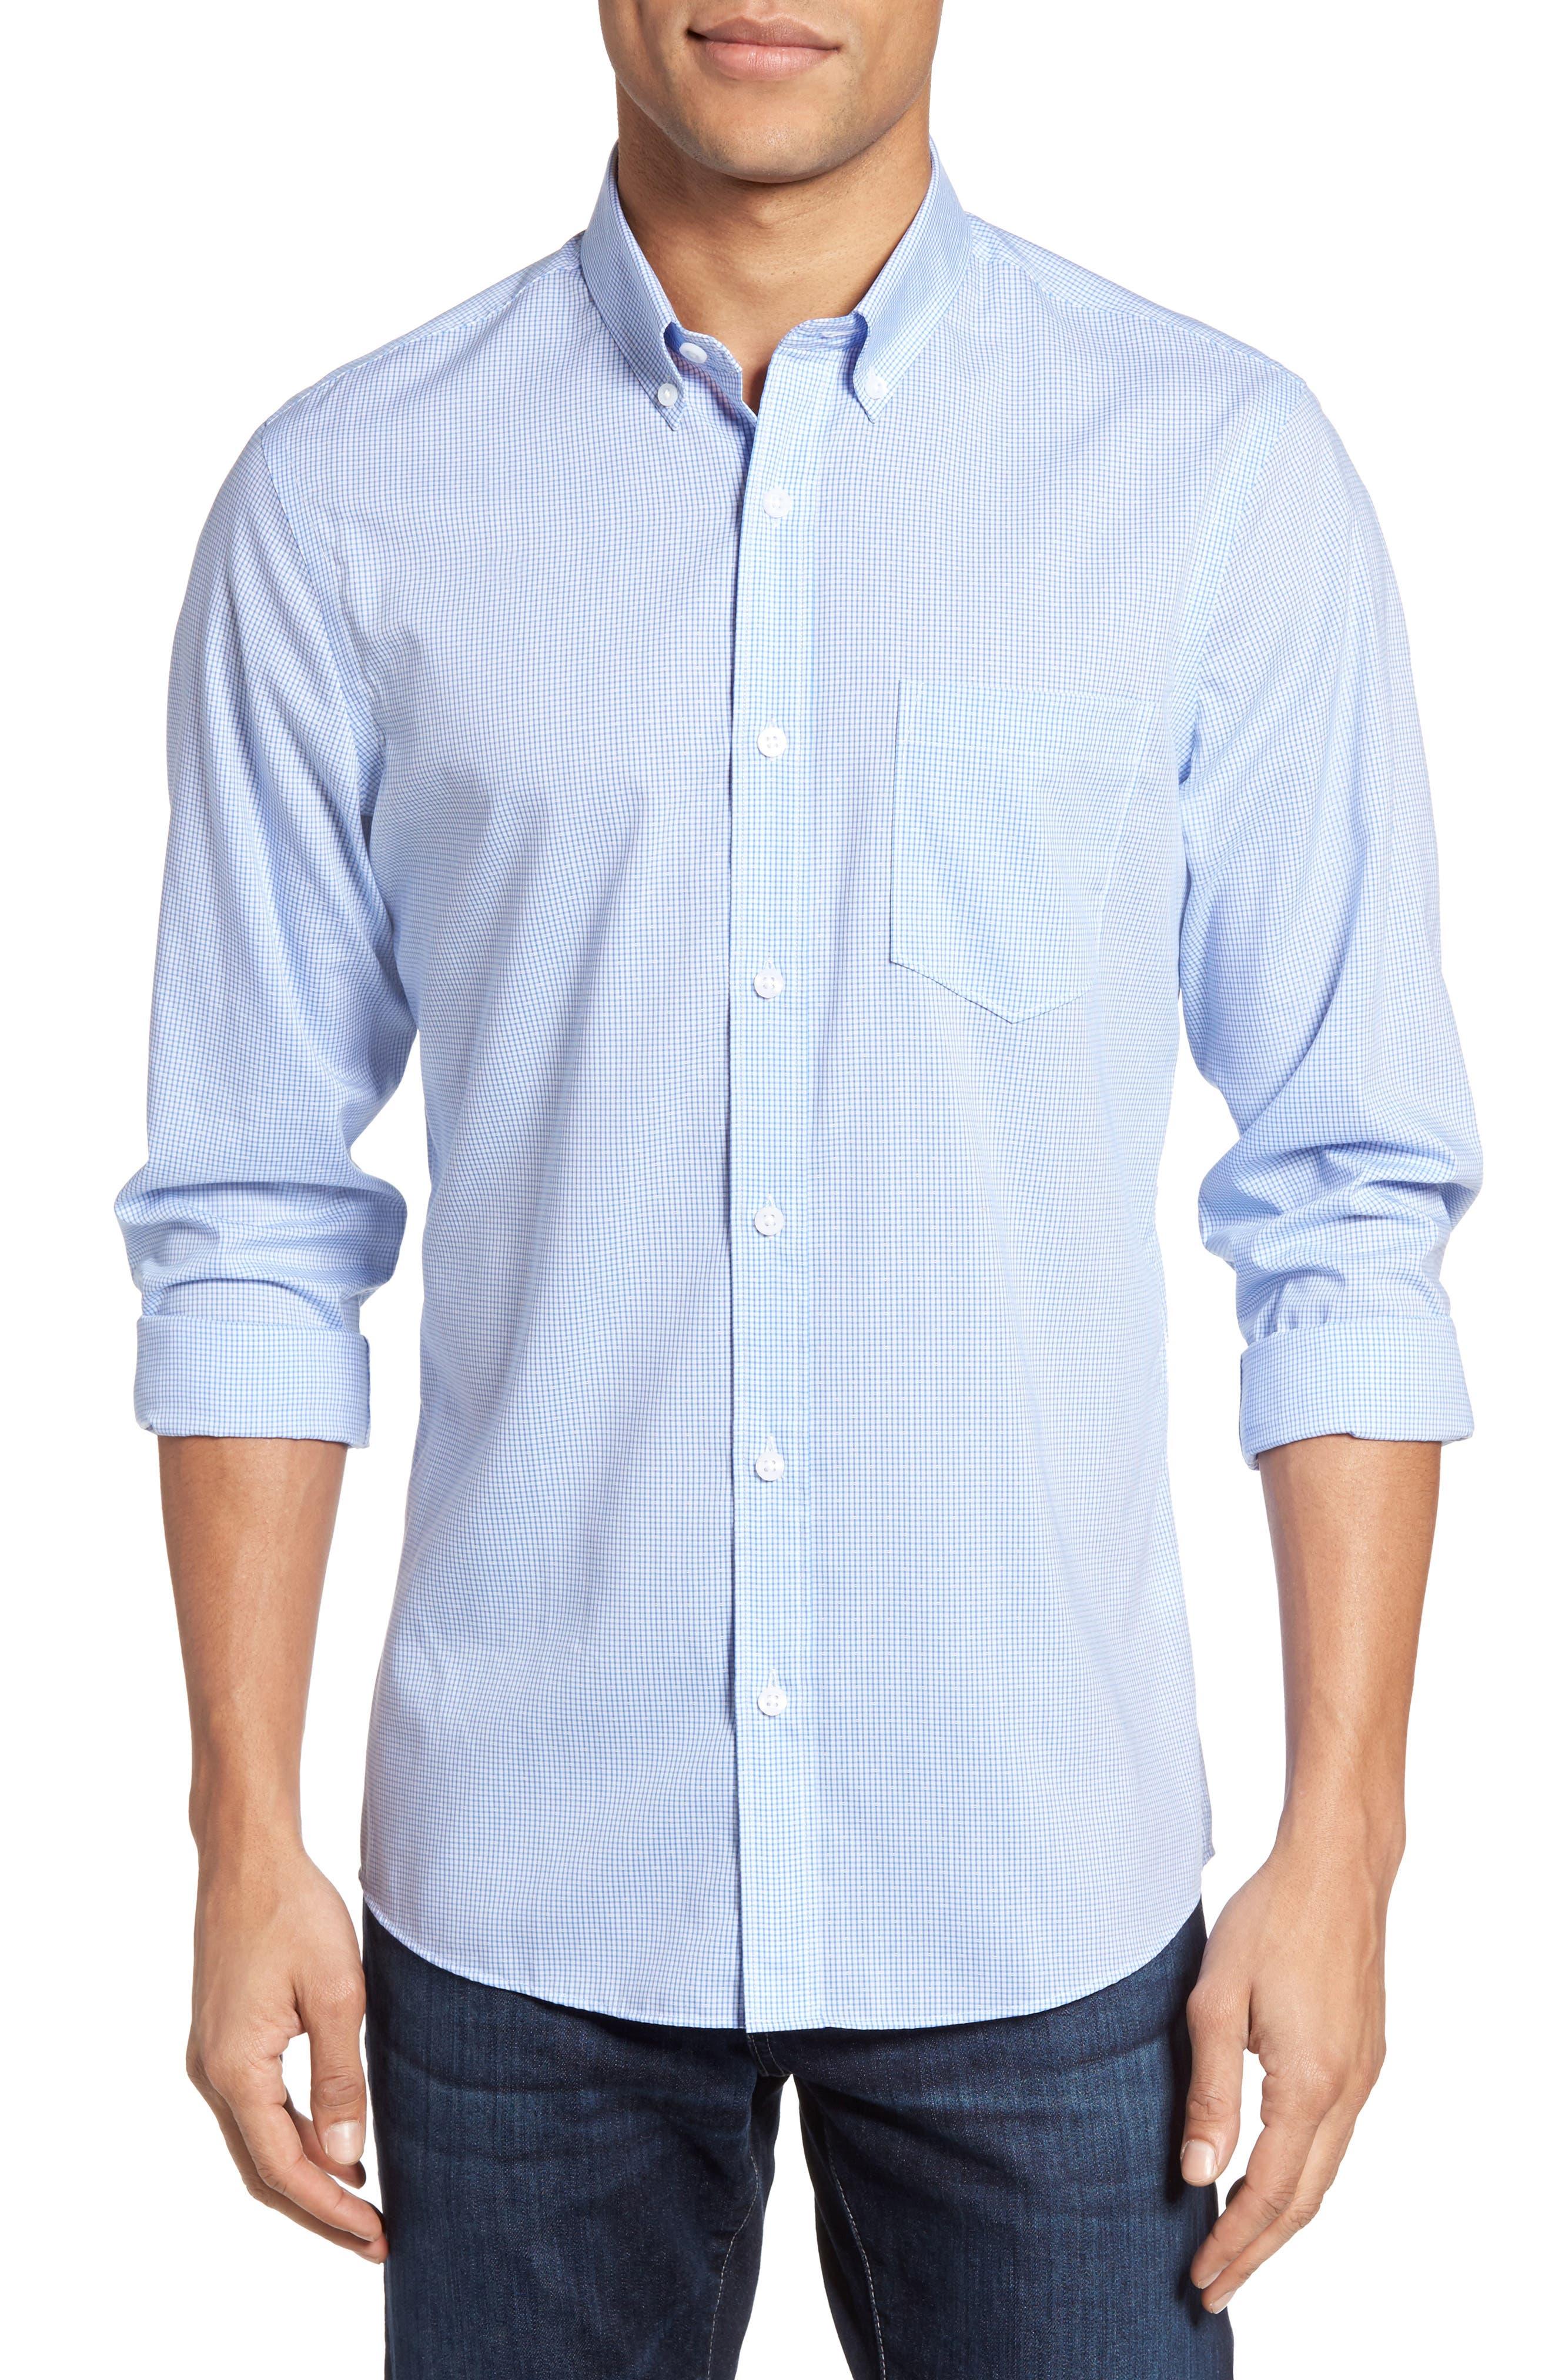 Alternate Image 1 Selected - Nordstrom Men's Shop Trim Fit Non-Iron Dobby Check Sport Shirt (Regular & Tall)